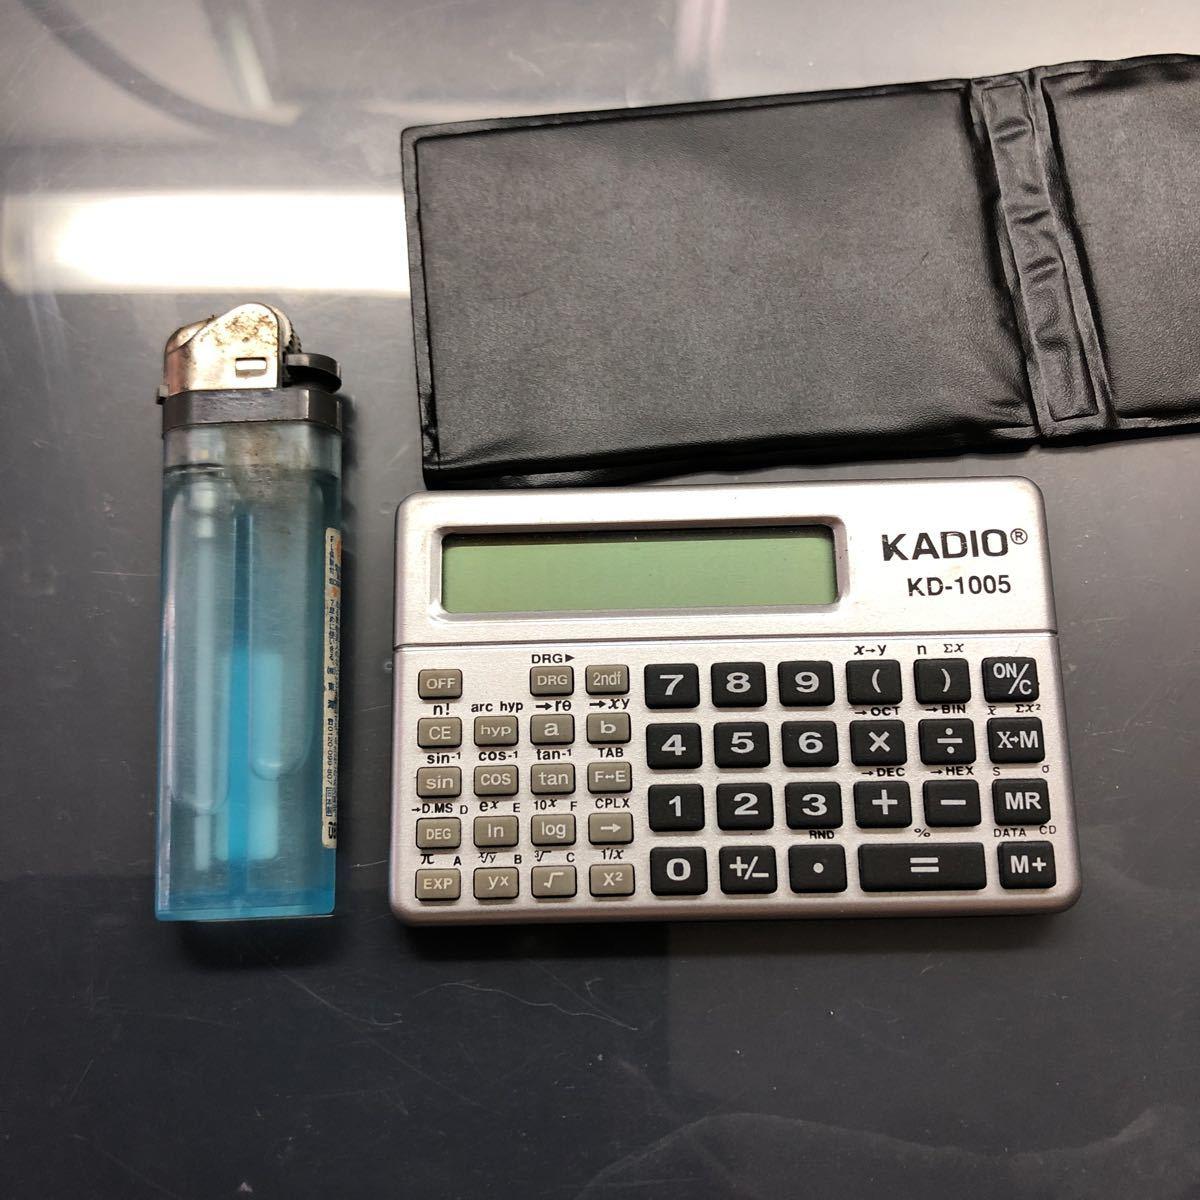 KADIO KD-1005 物凄く小さい関数電卓中古美品_画像7